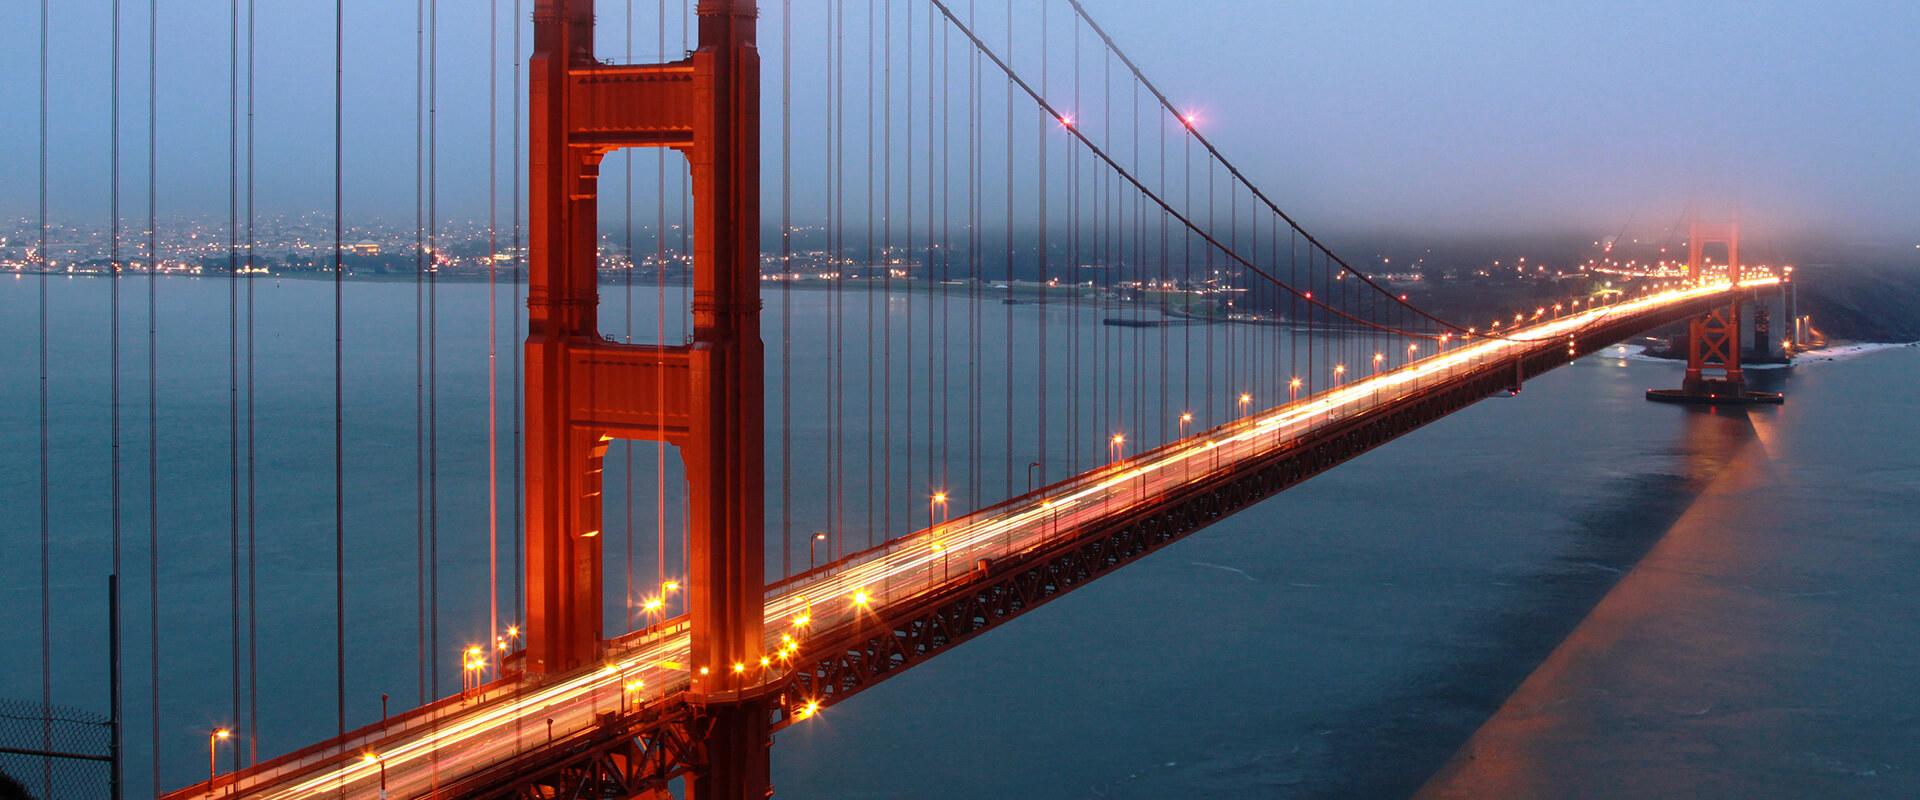 Экскурсия по Сан-Франциско и Лос-Анджелесу